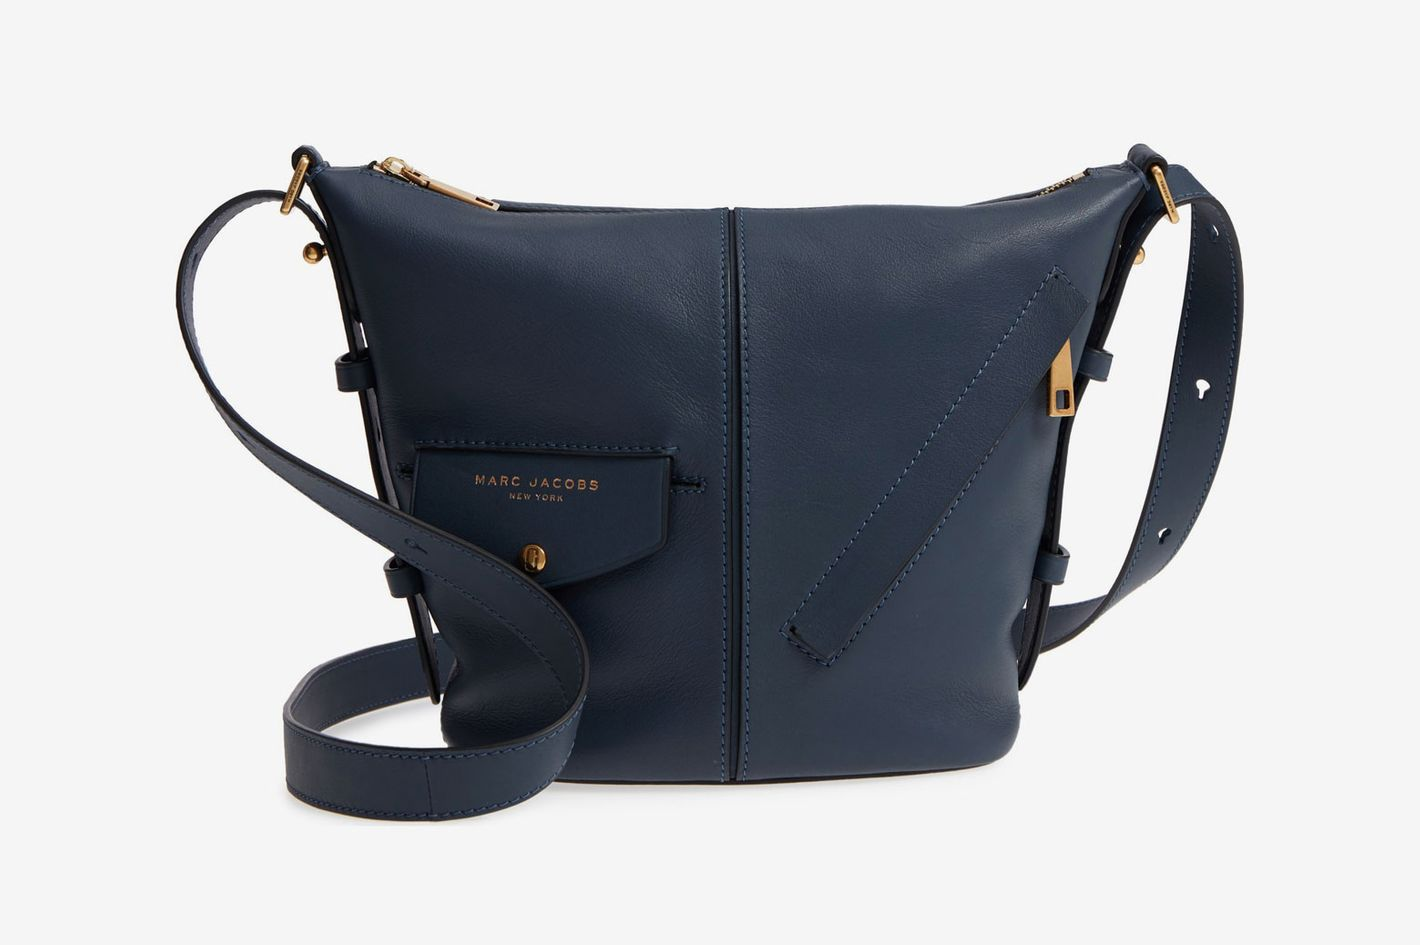 Marc Jacobs Mini Sling Convertible Leather Hobo